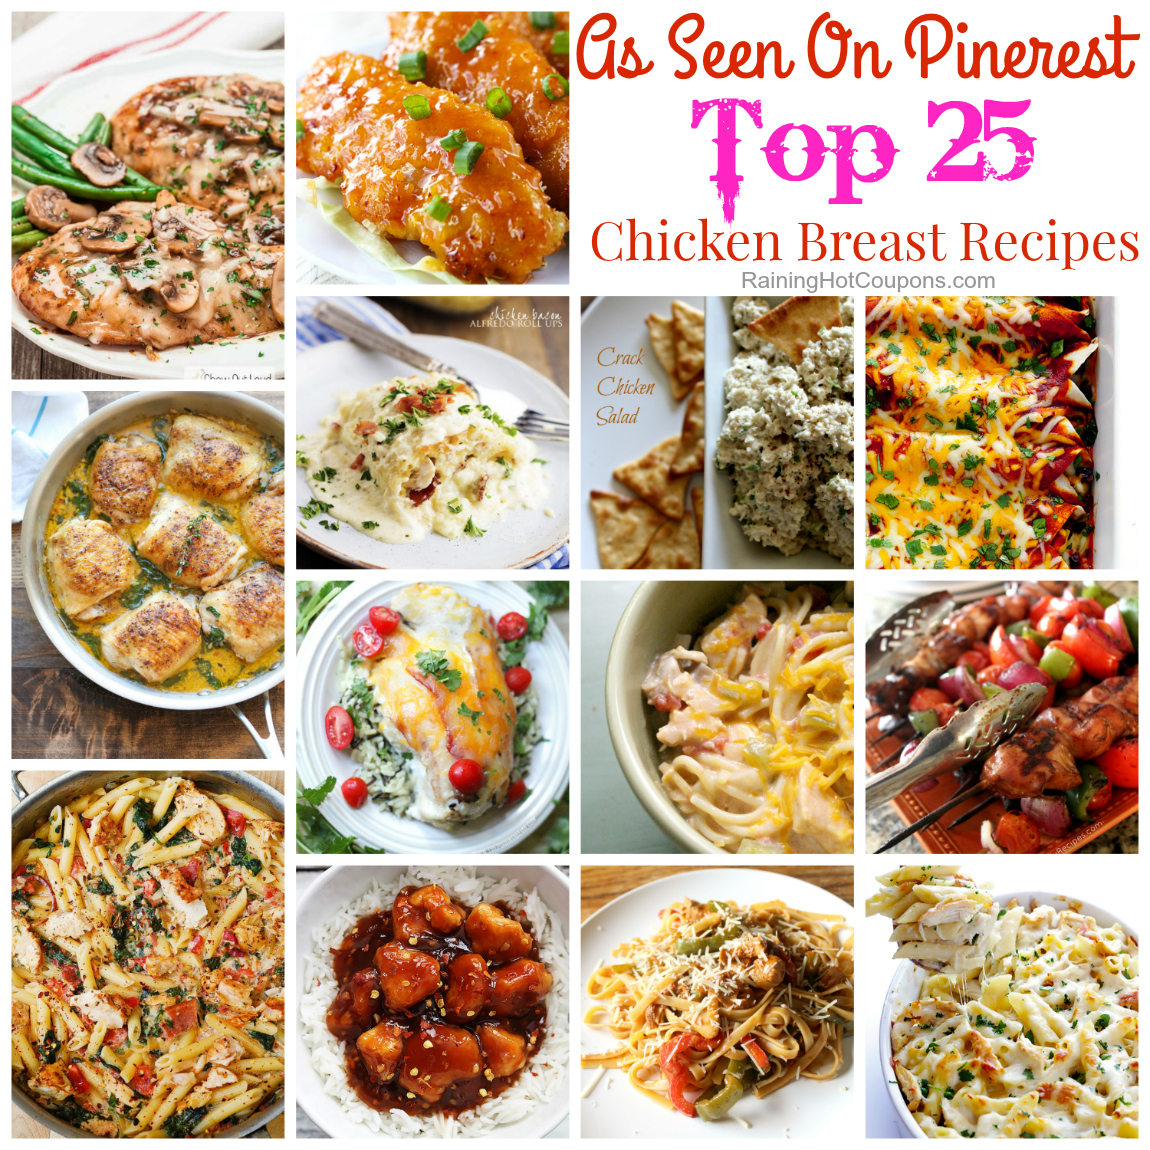 Chicken BReast Recipes RainingHotCoupons.com.jpg